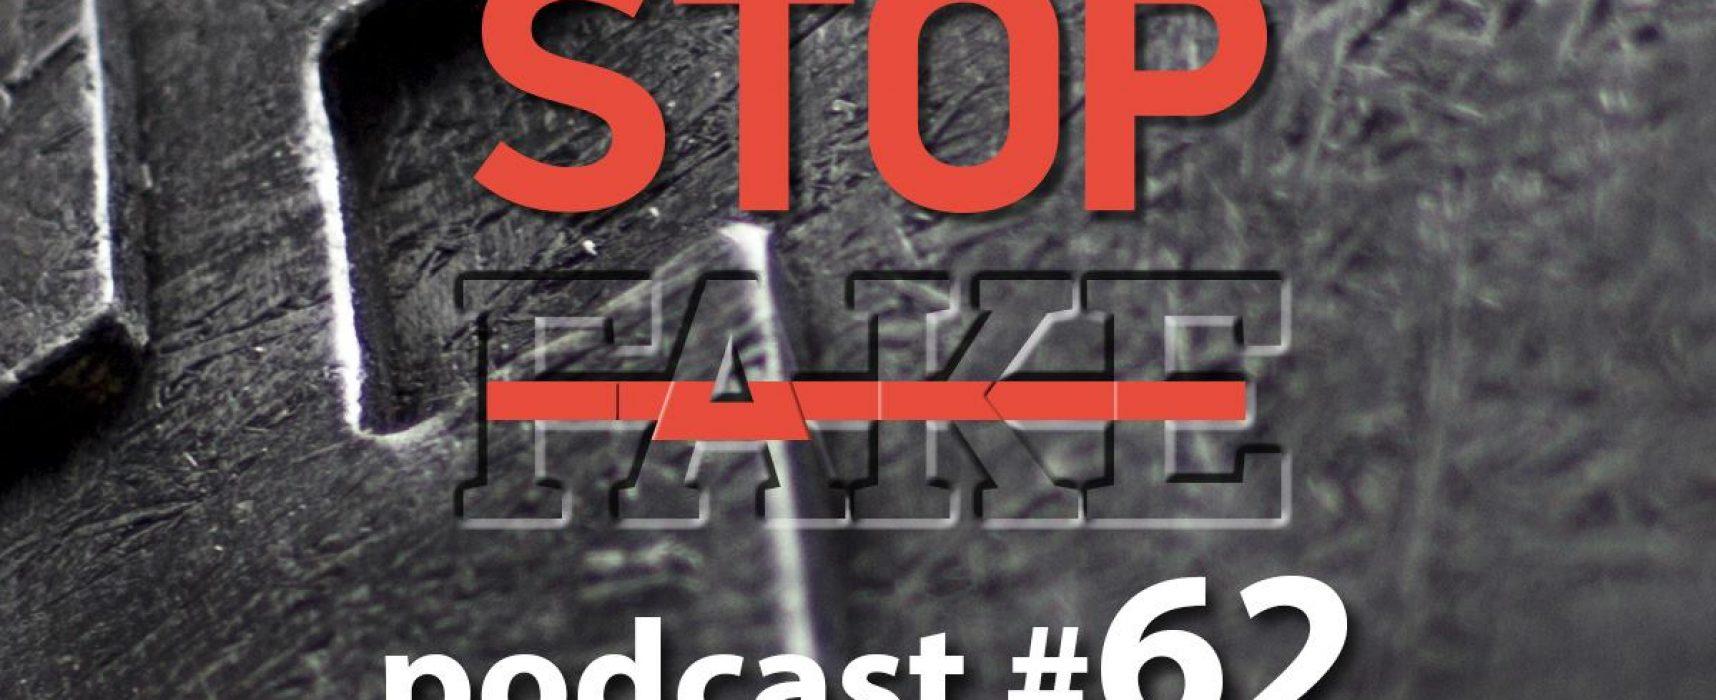 StopFake podcast #62